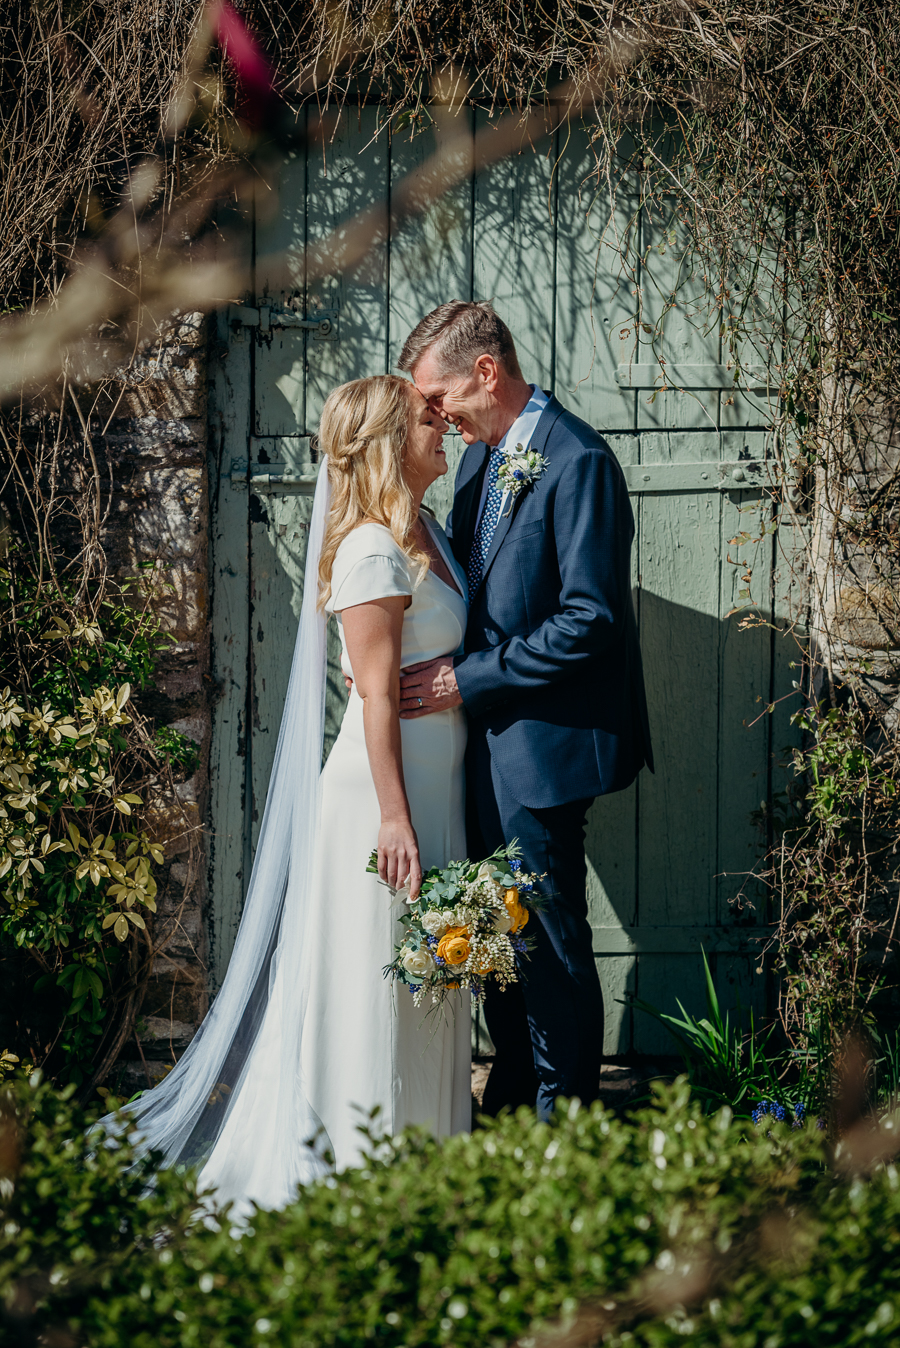 Pippa & David's joyful spring elopement in Dartmoor, photo credit Clare Kinchin (9)